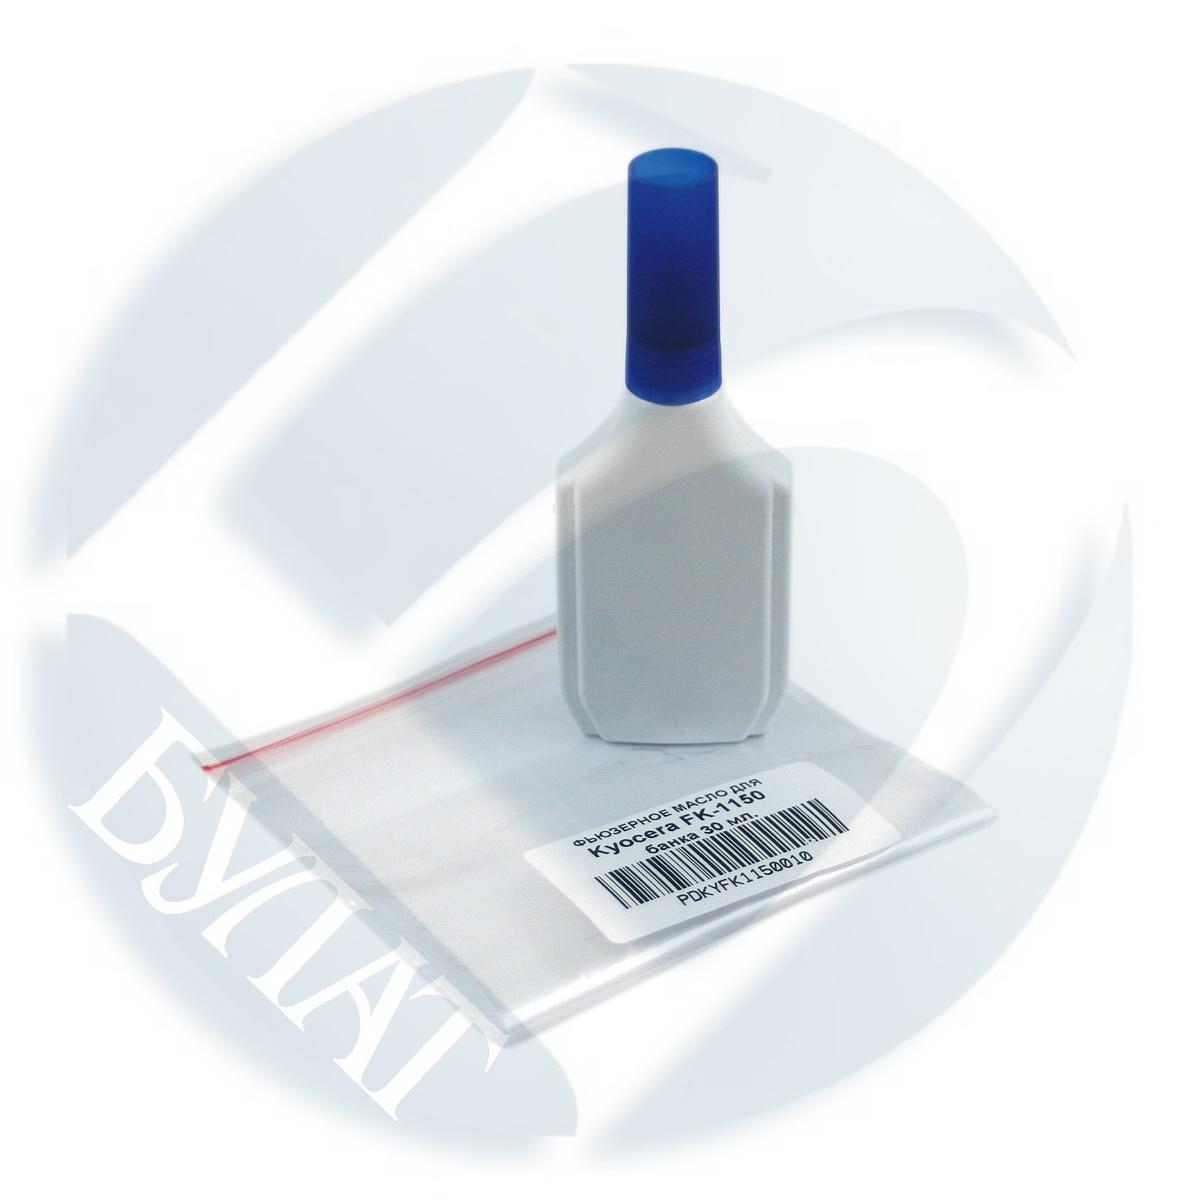 Фьюзерное масло для Kyocera Ricoh Xerox Lexmark банка 30 мл Универсальное масло для узлов термозакрепления